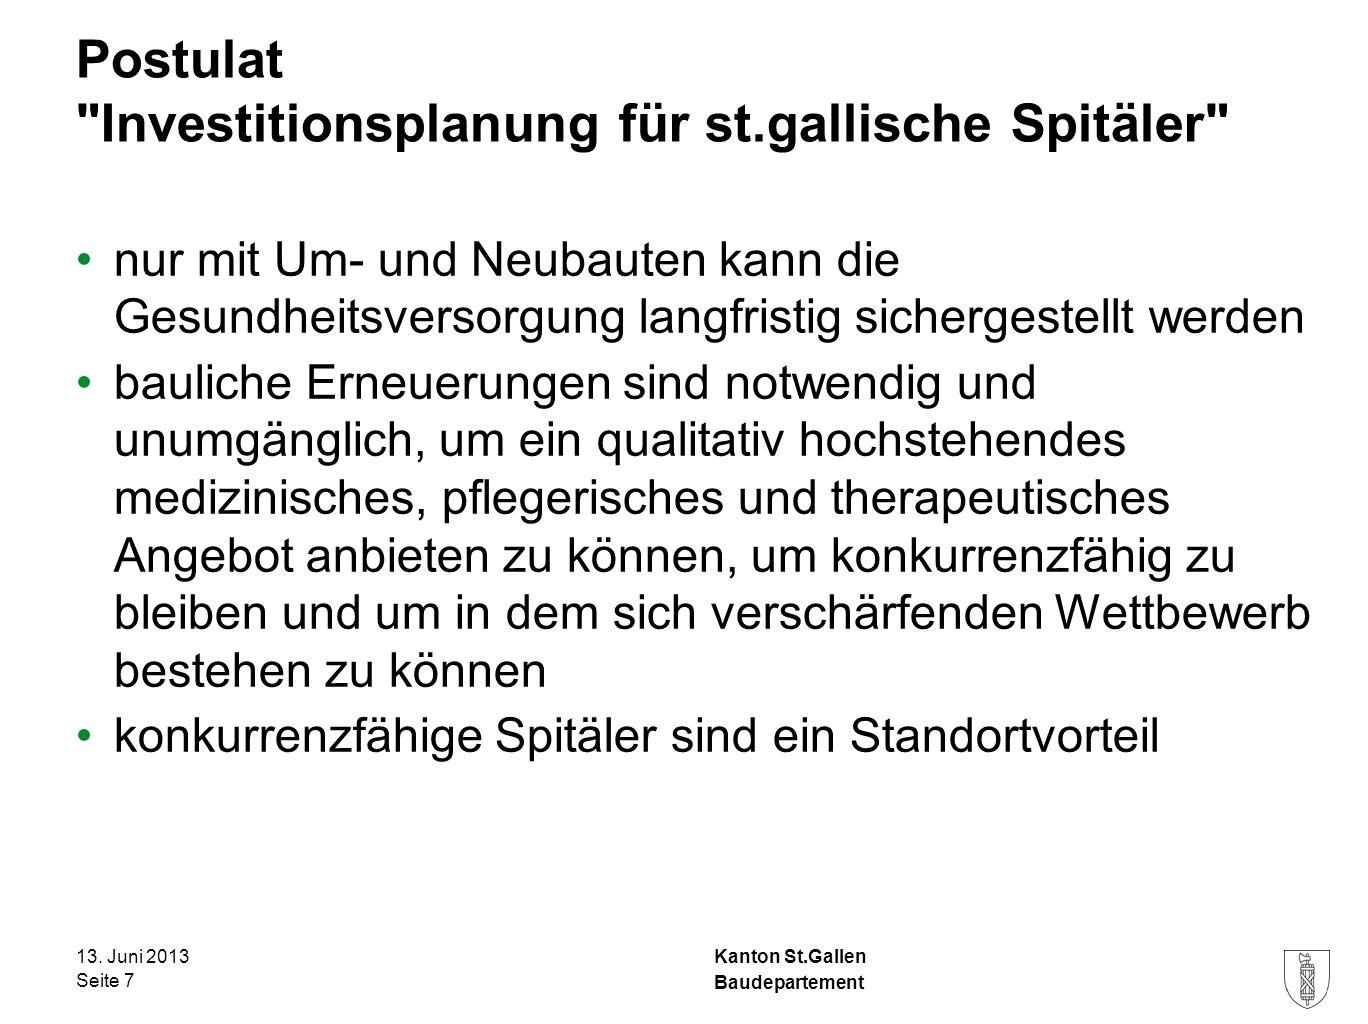 Kanton St.Gallen Postulat Spital-Neubauplanung im Rheintal Postulat 43.09.10 Rechtzeitige Spital-Neubauplanung im Rheintal vom 10.